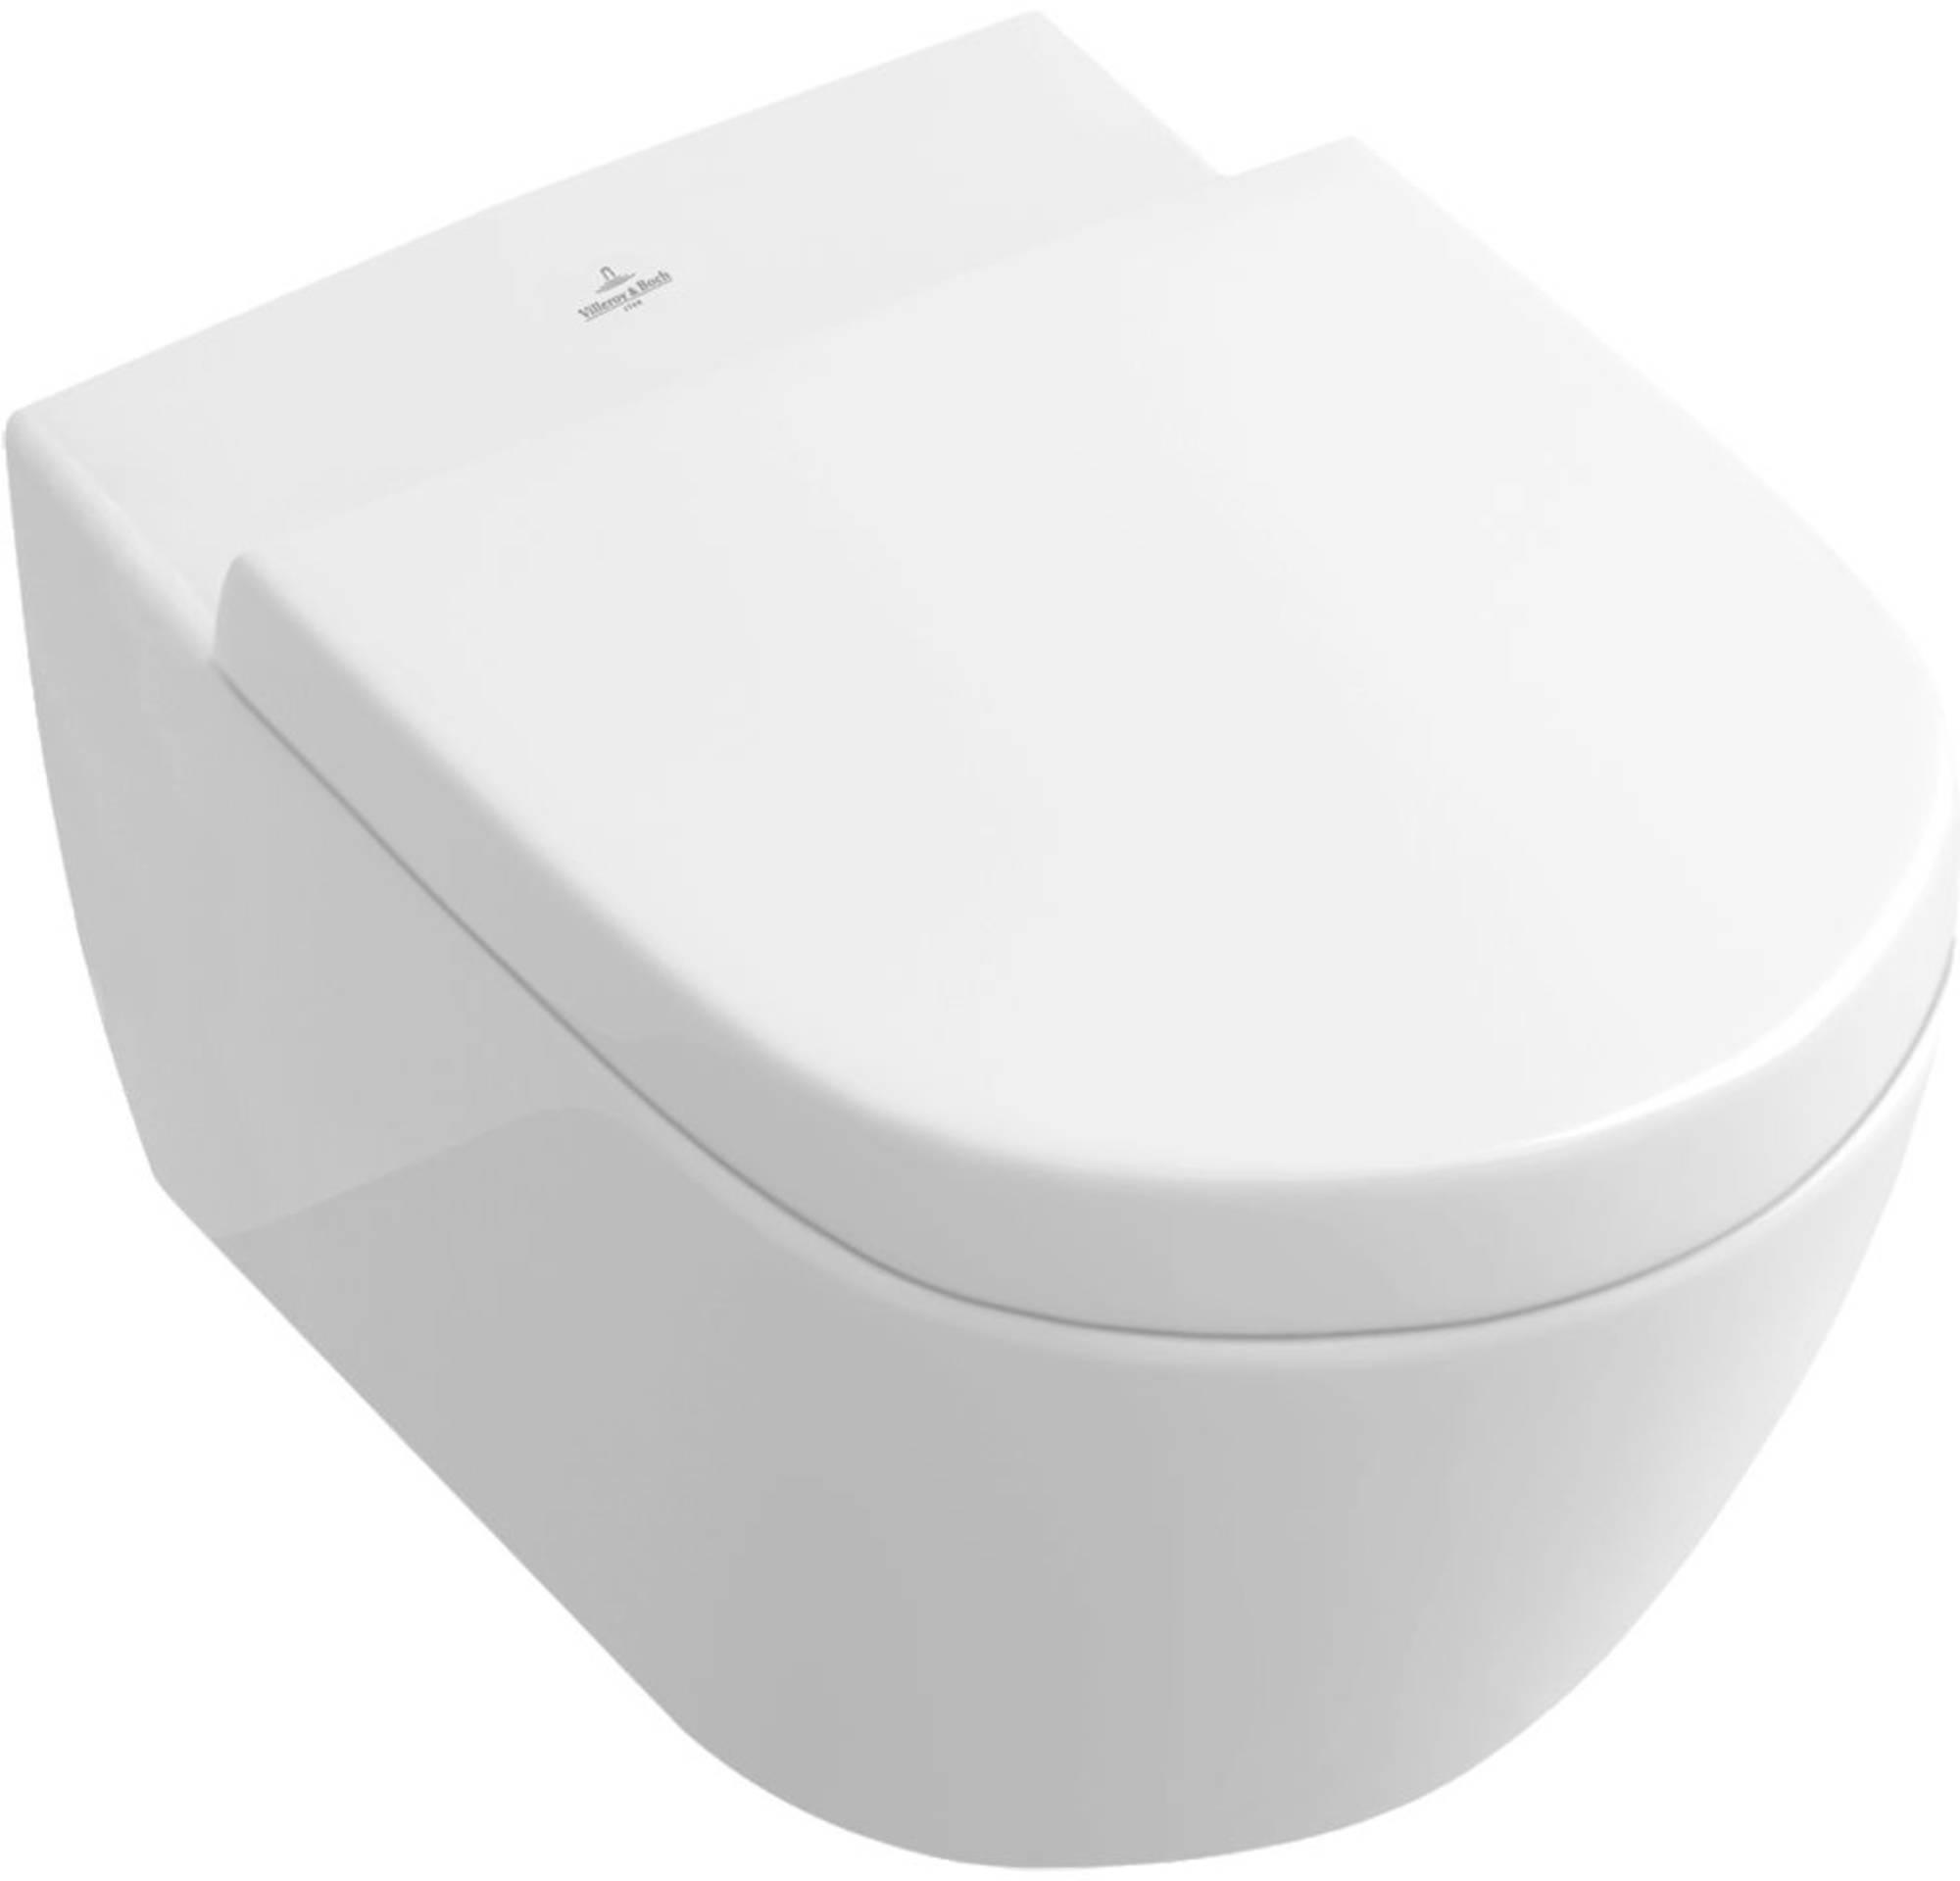 Villeroy & boch Subway 2.0 wandcloset direct flush, wit